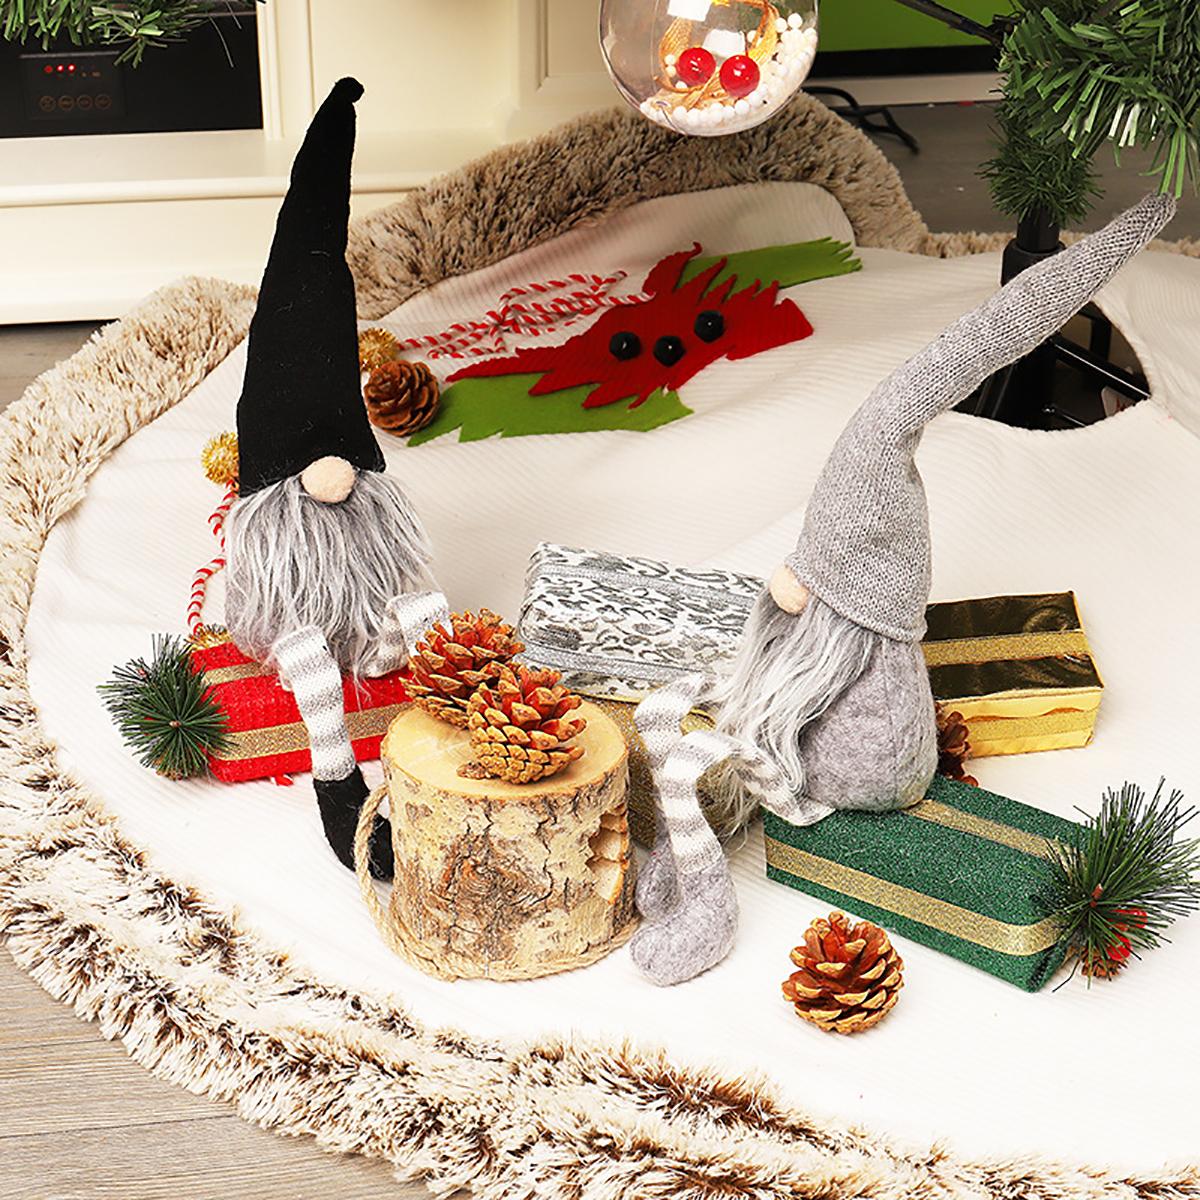 Christmas Doll Ornaments Christmas Elf Decorations 48cm Santa Claus No Faced Dolls Home Decorations